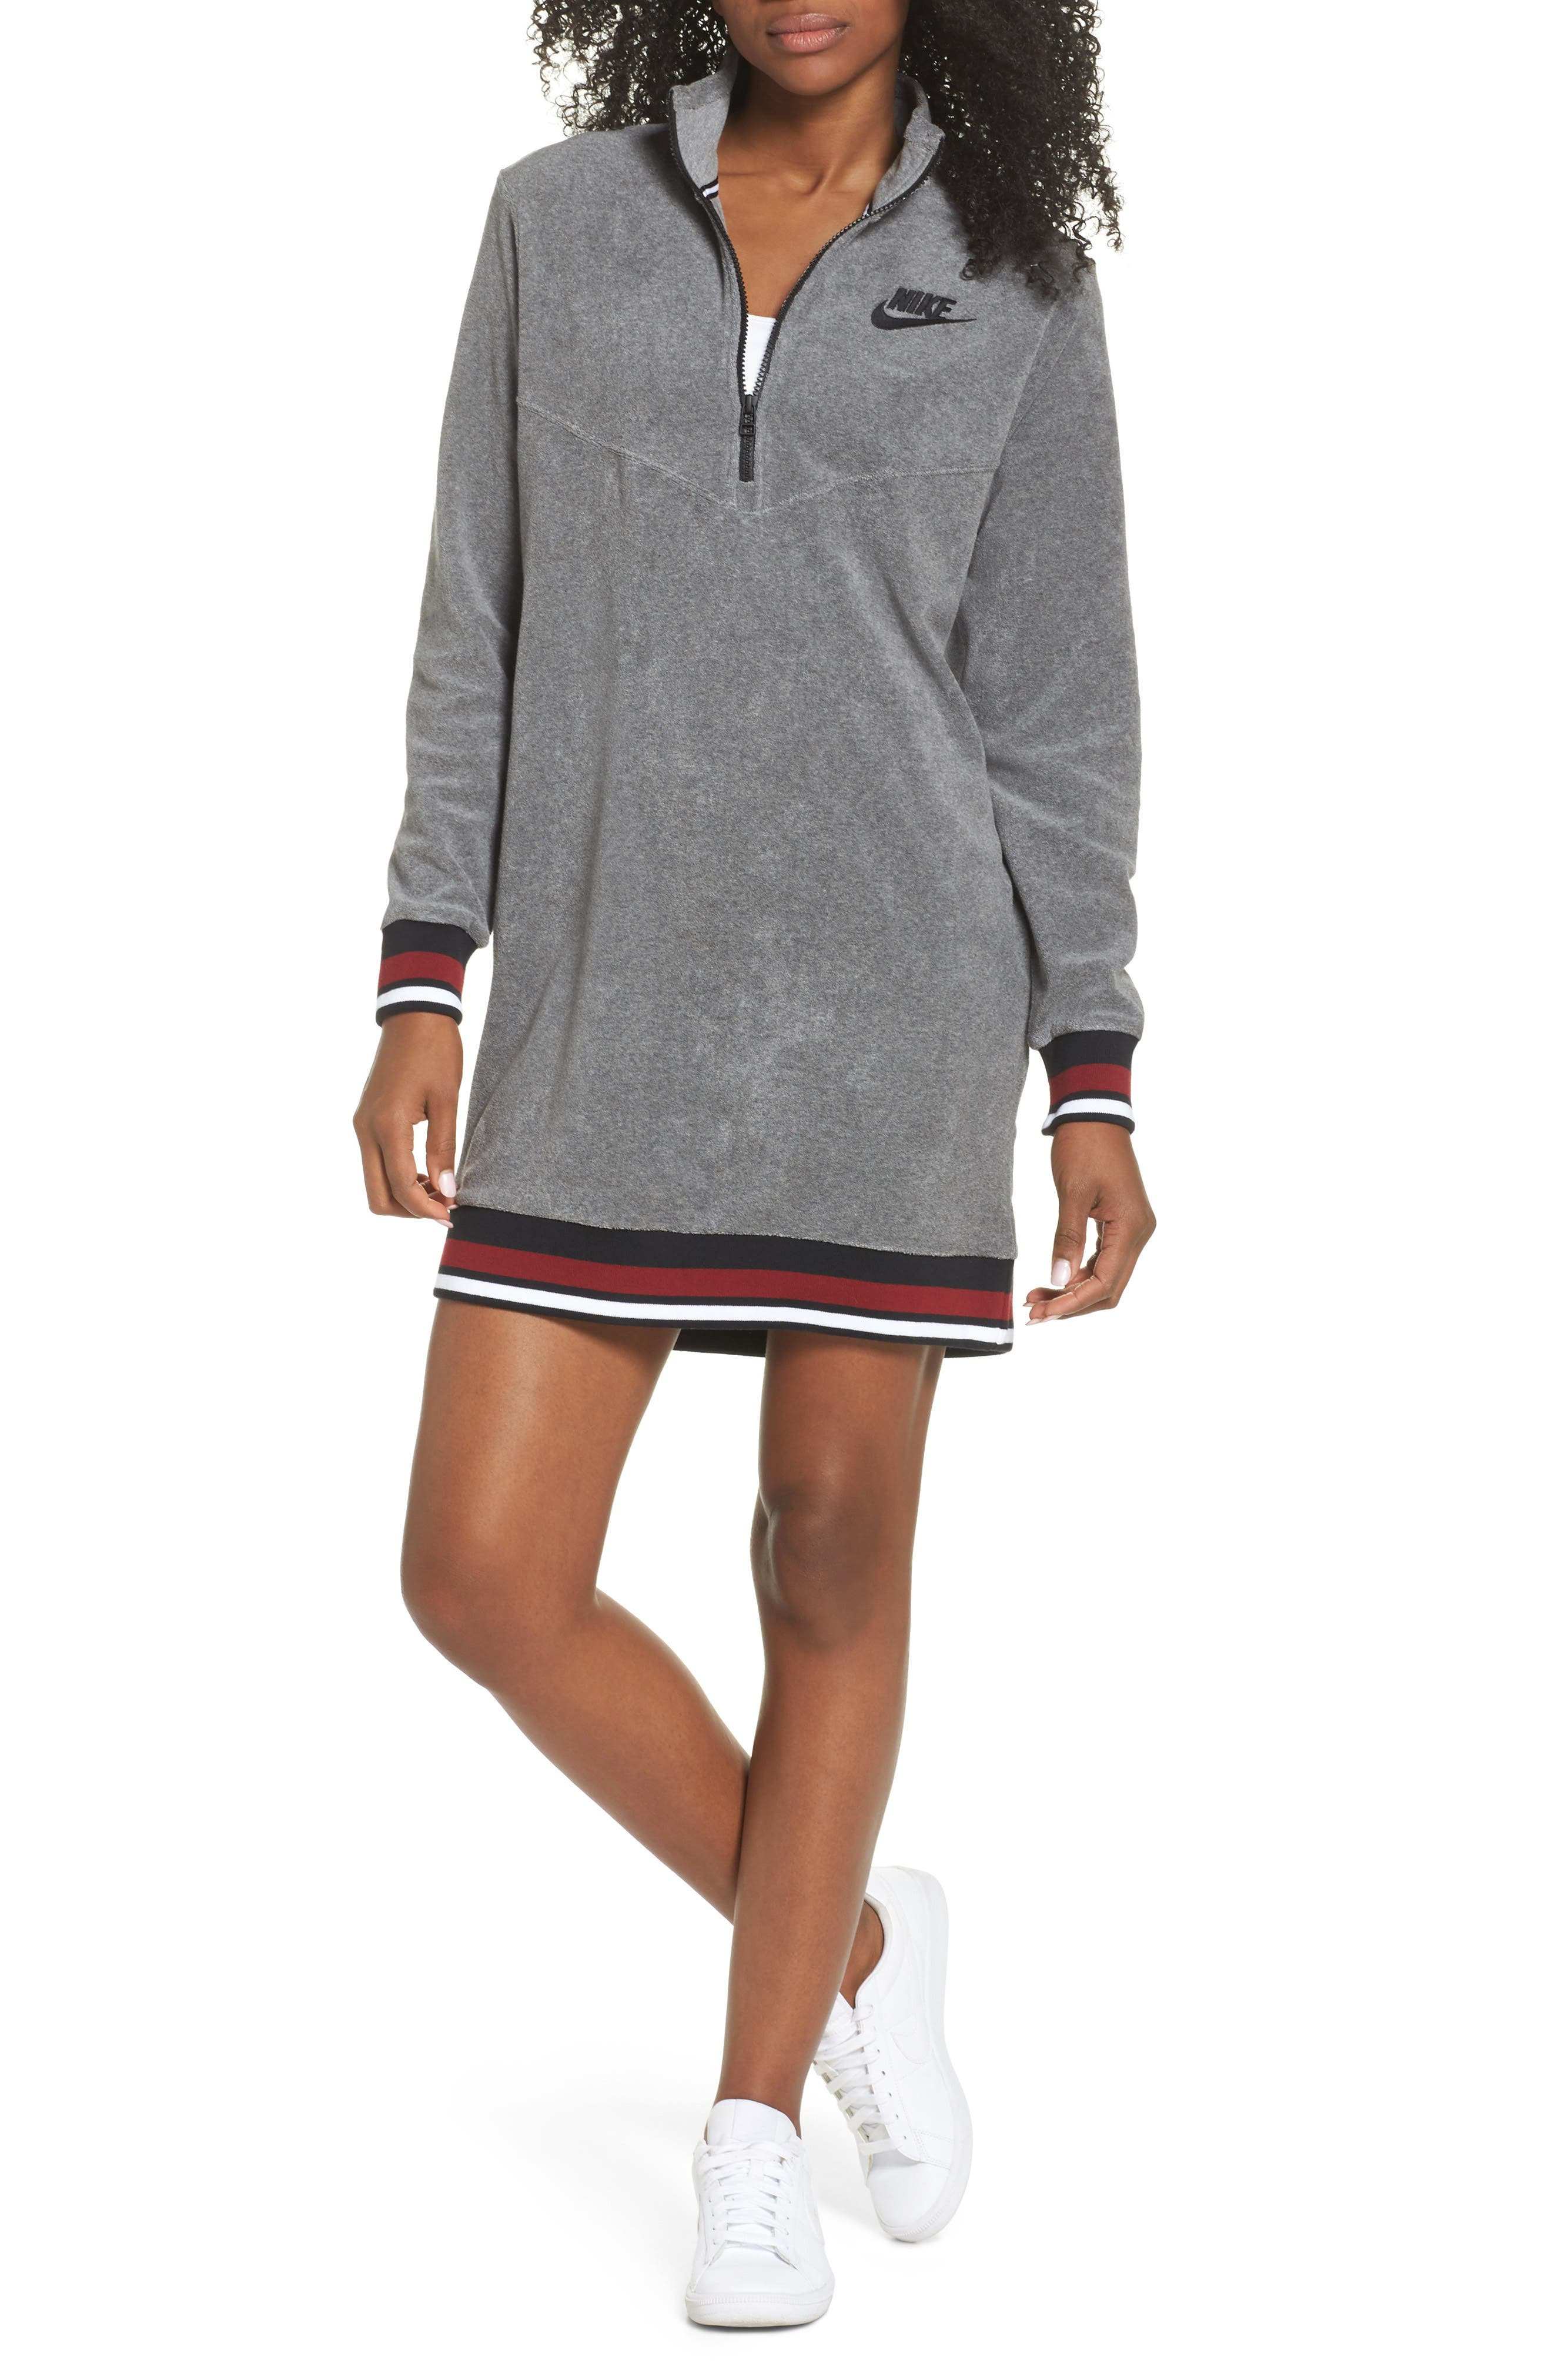 Nike Sportswear French Terry Sweatshirt Dress